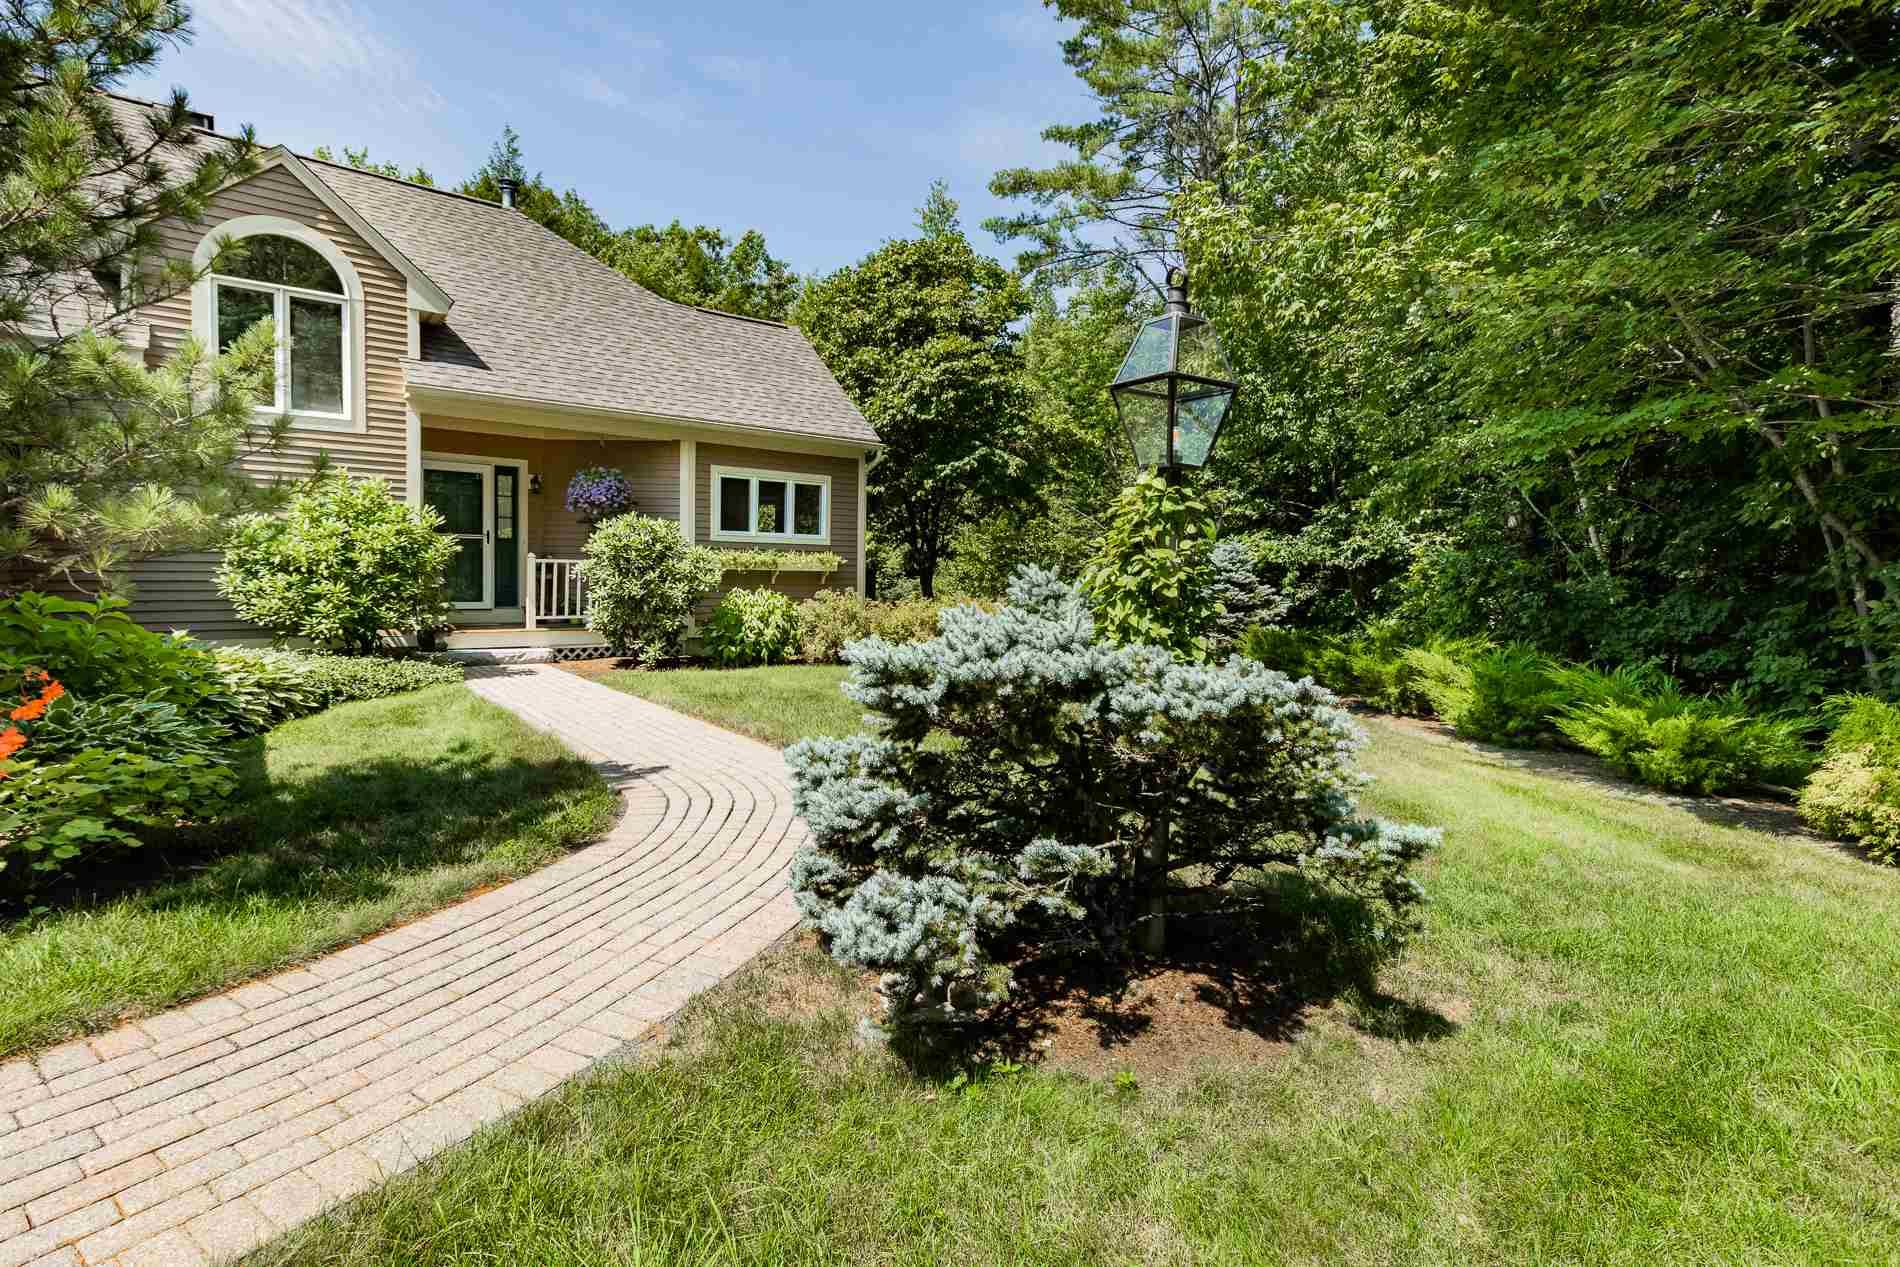 17 Berrill Farms Lane, Hanover, NH 03755 - MLS#: 4822346